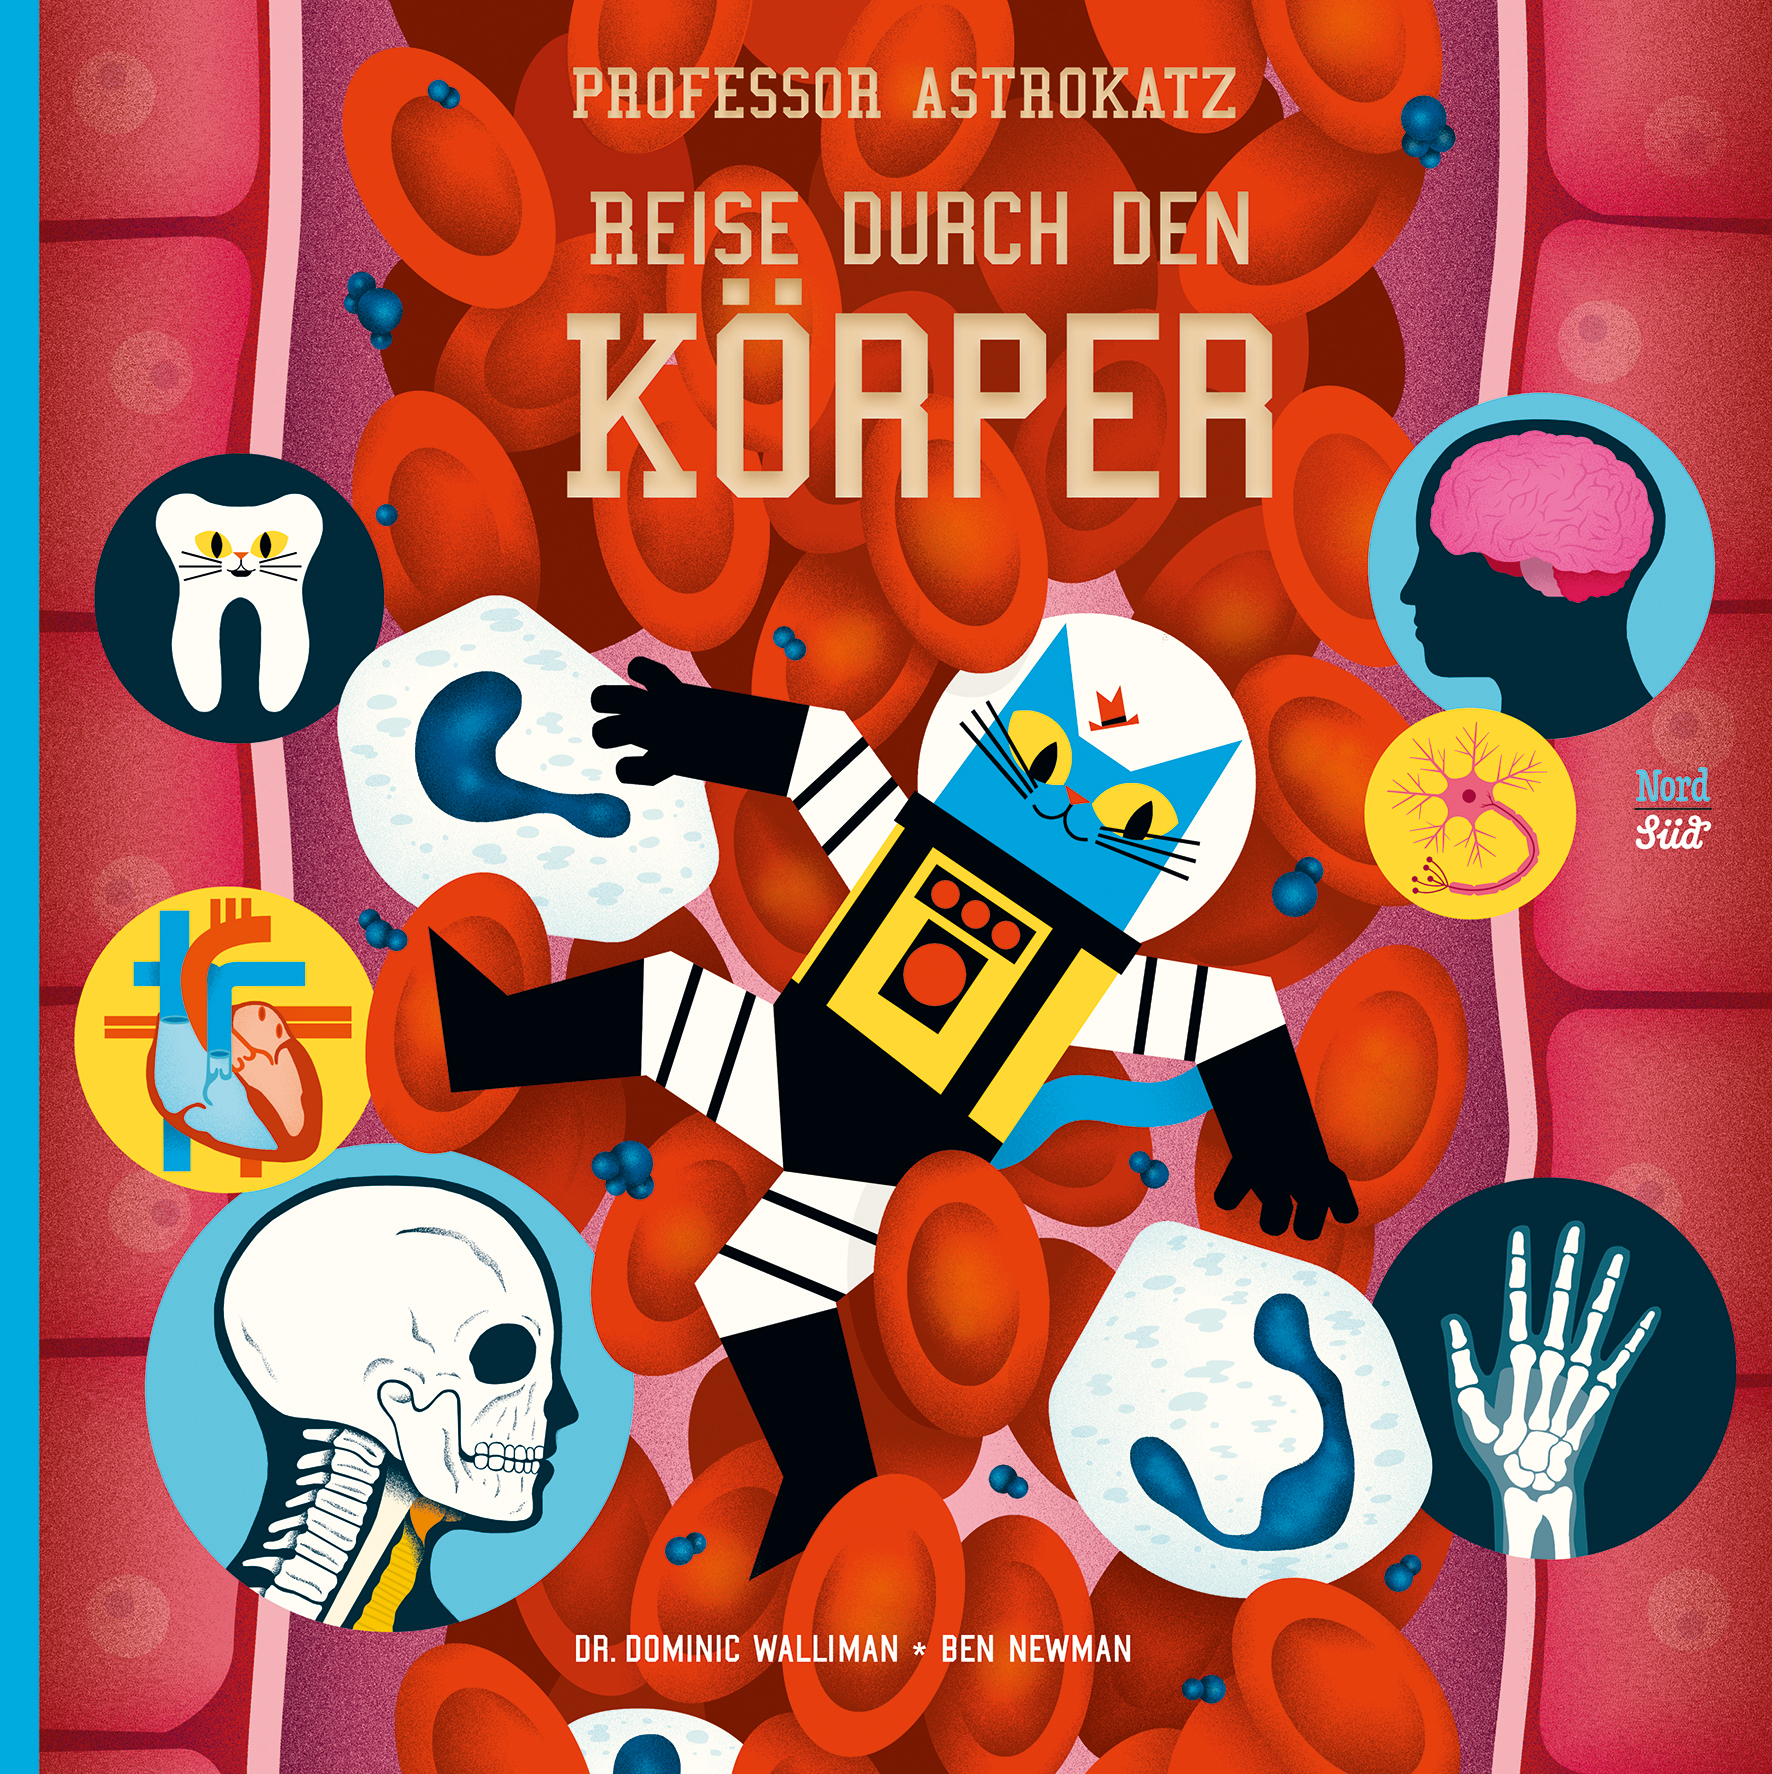 Professor Astrokatz Reise durch den Körper Book Cover